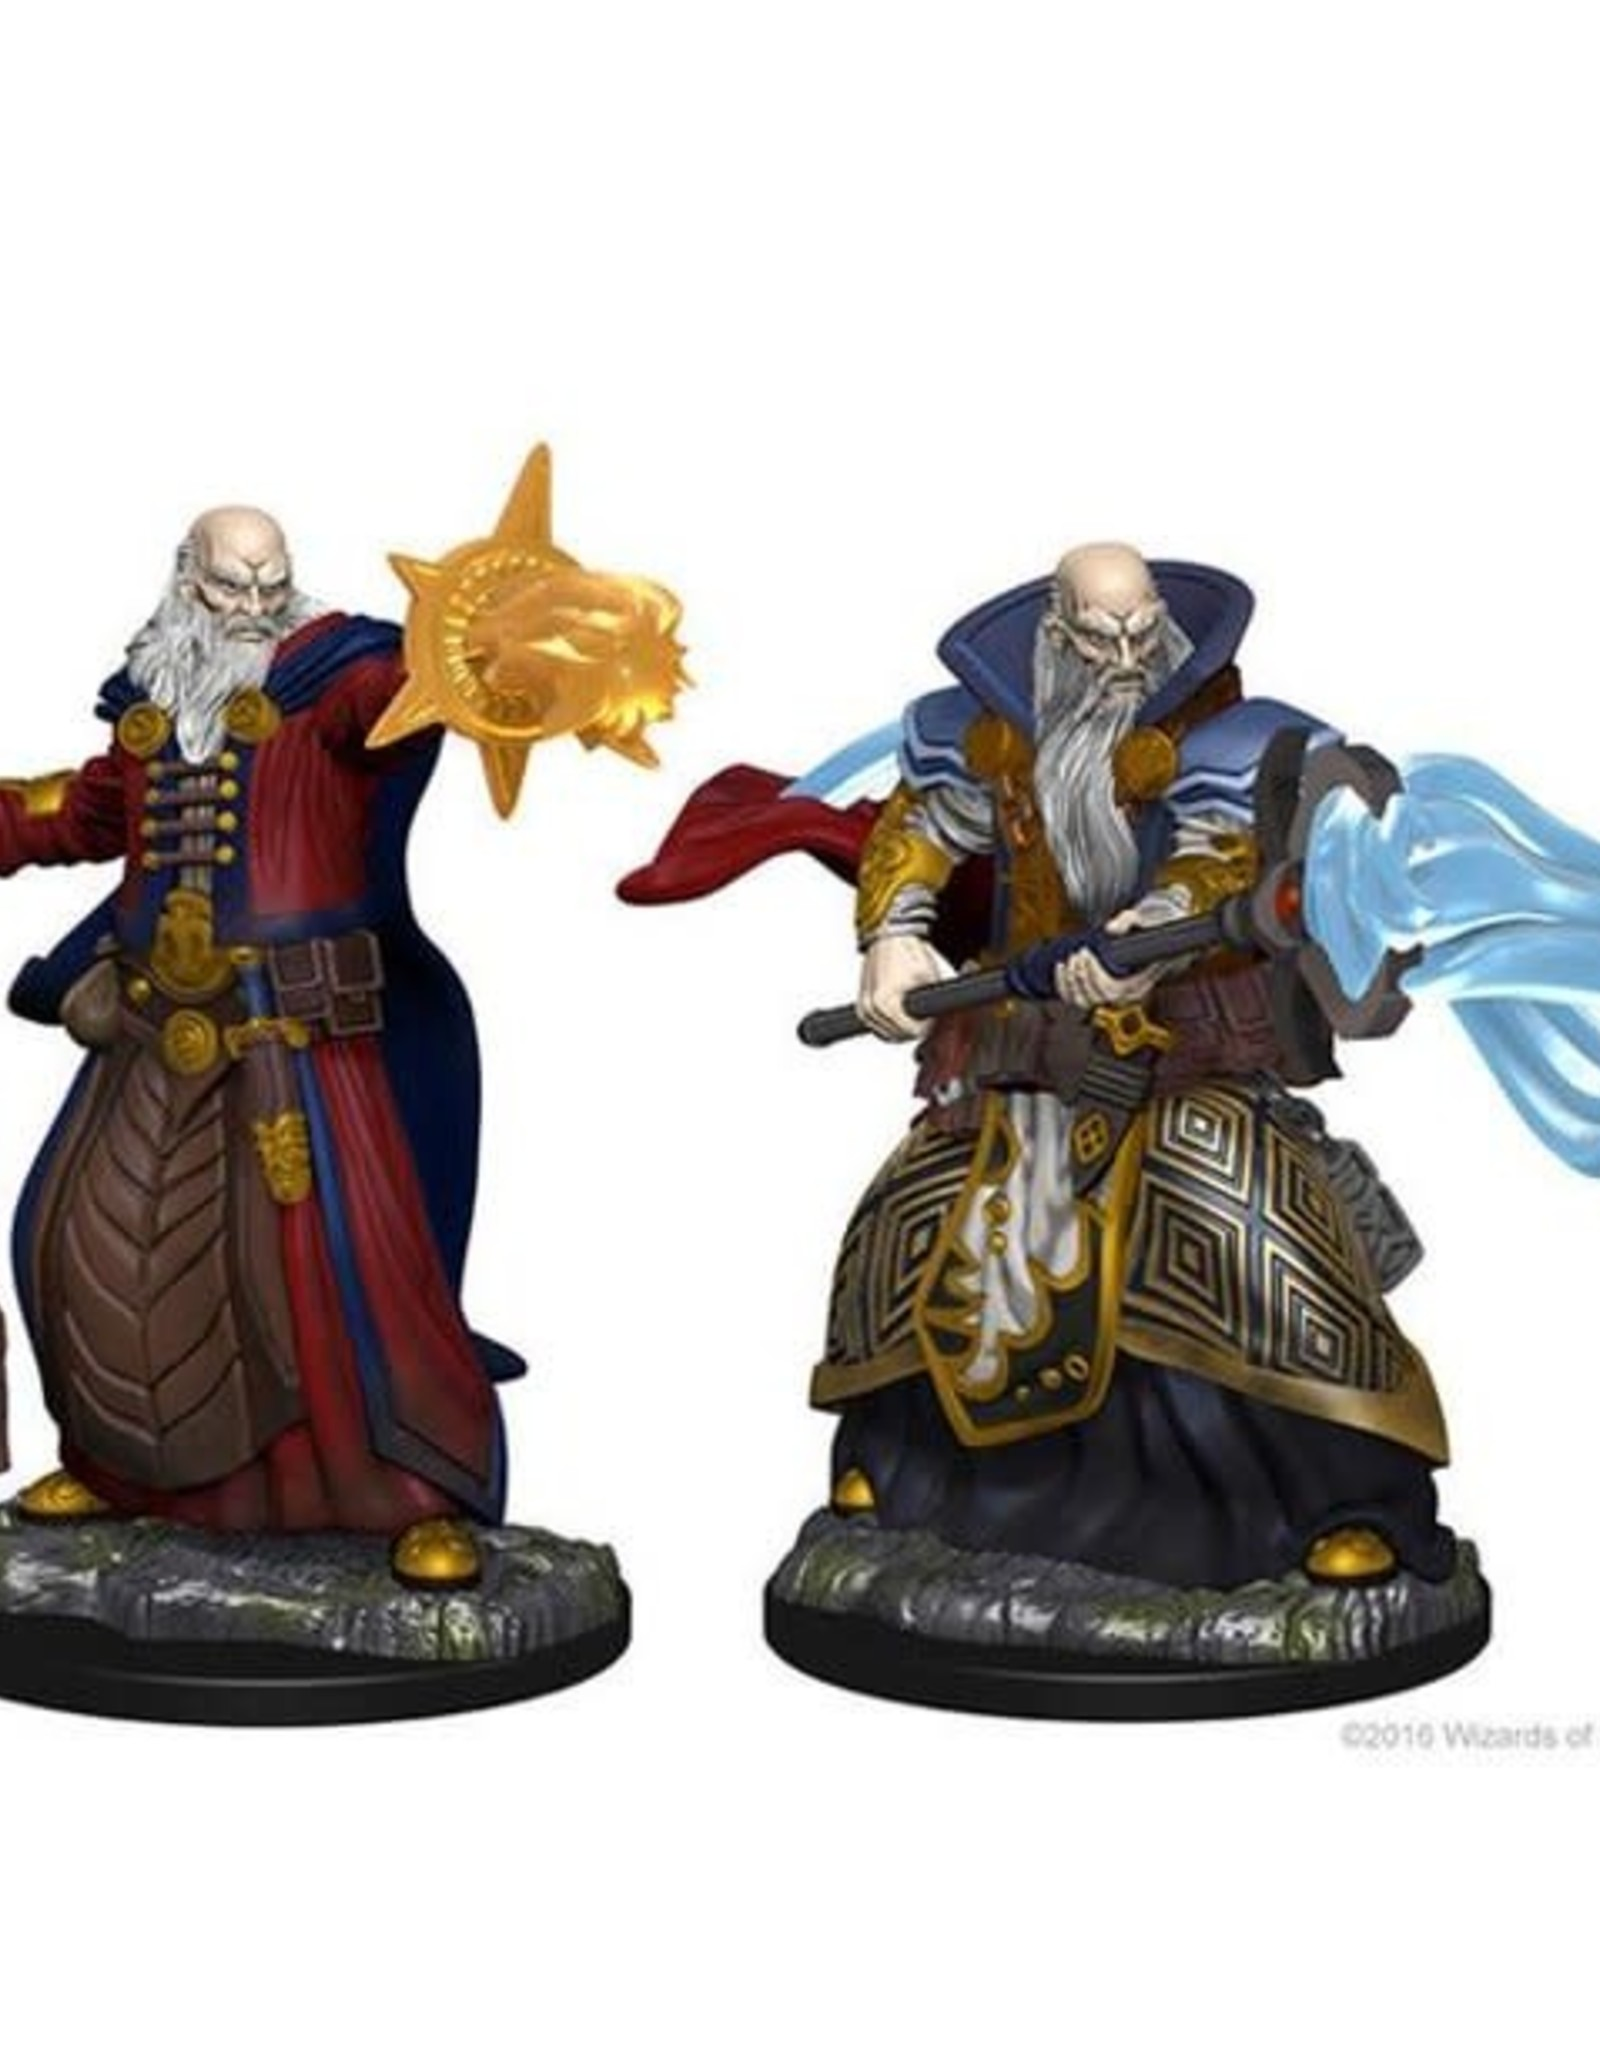 Dungeons & Dragons D&D NMU - Human Wizard